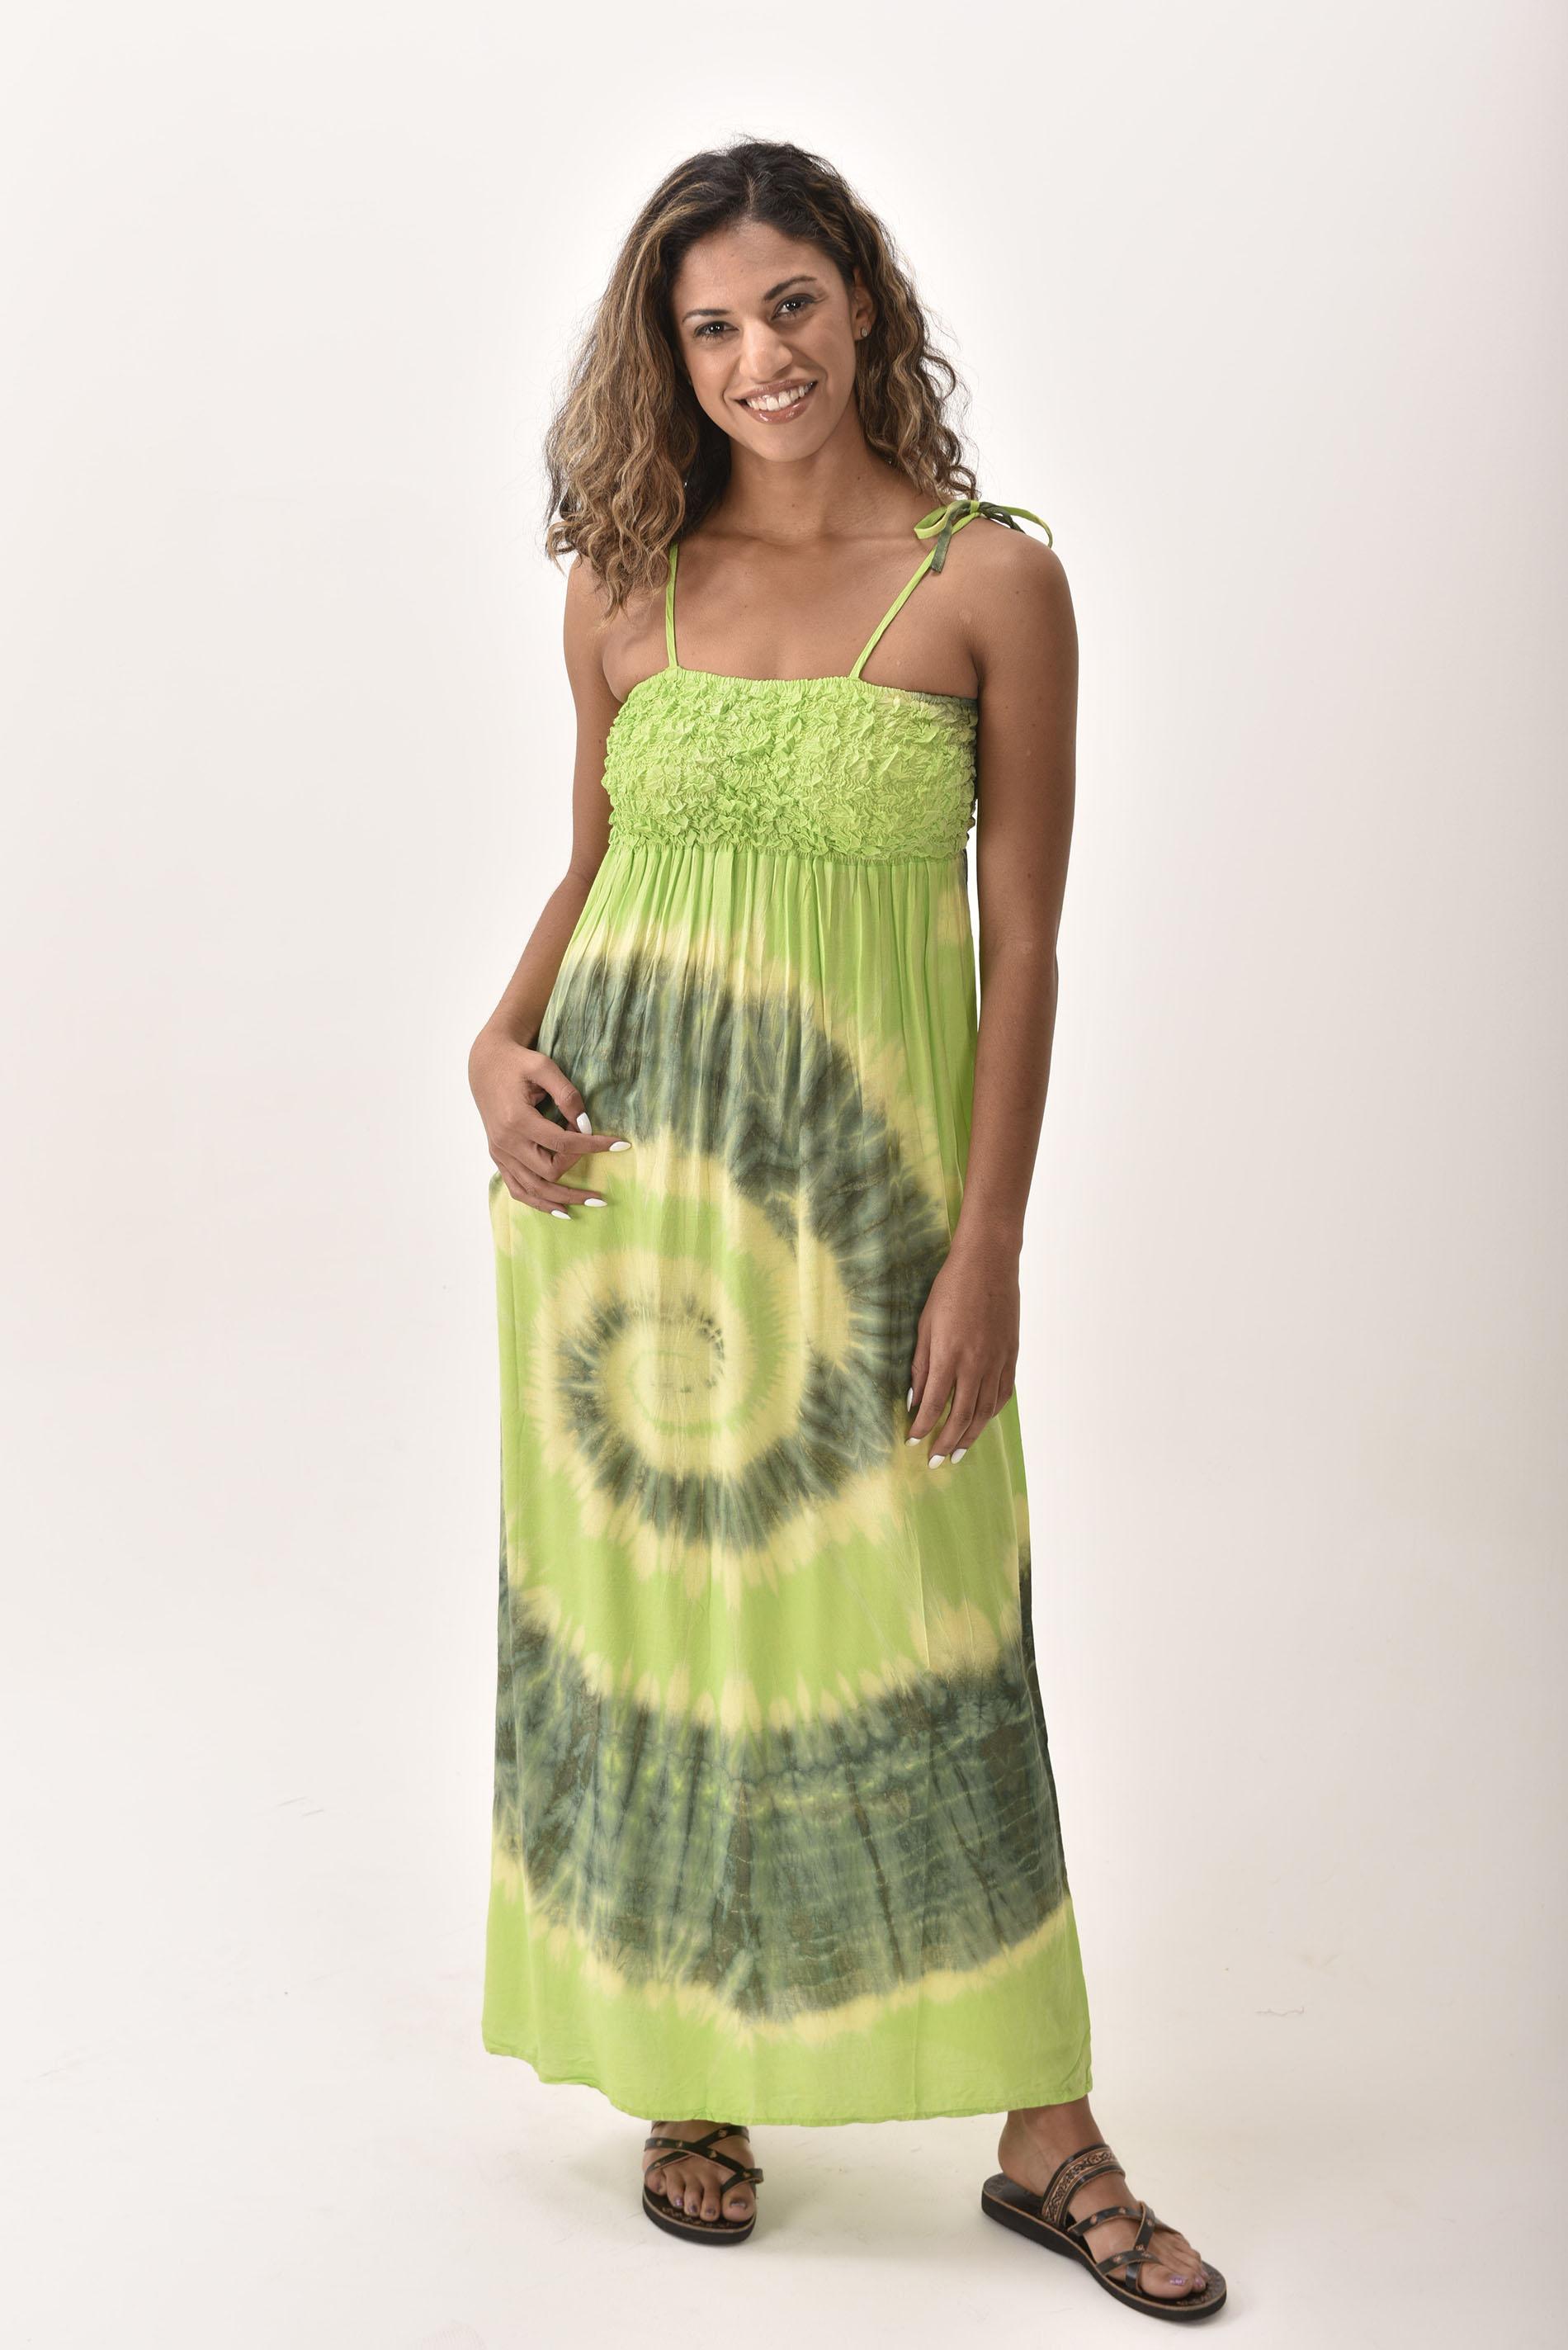 Maxi Dress, Hand Painted Tie Dye, Green Orange